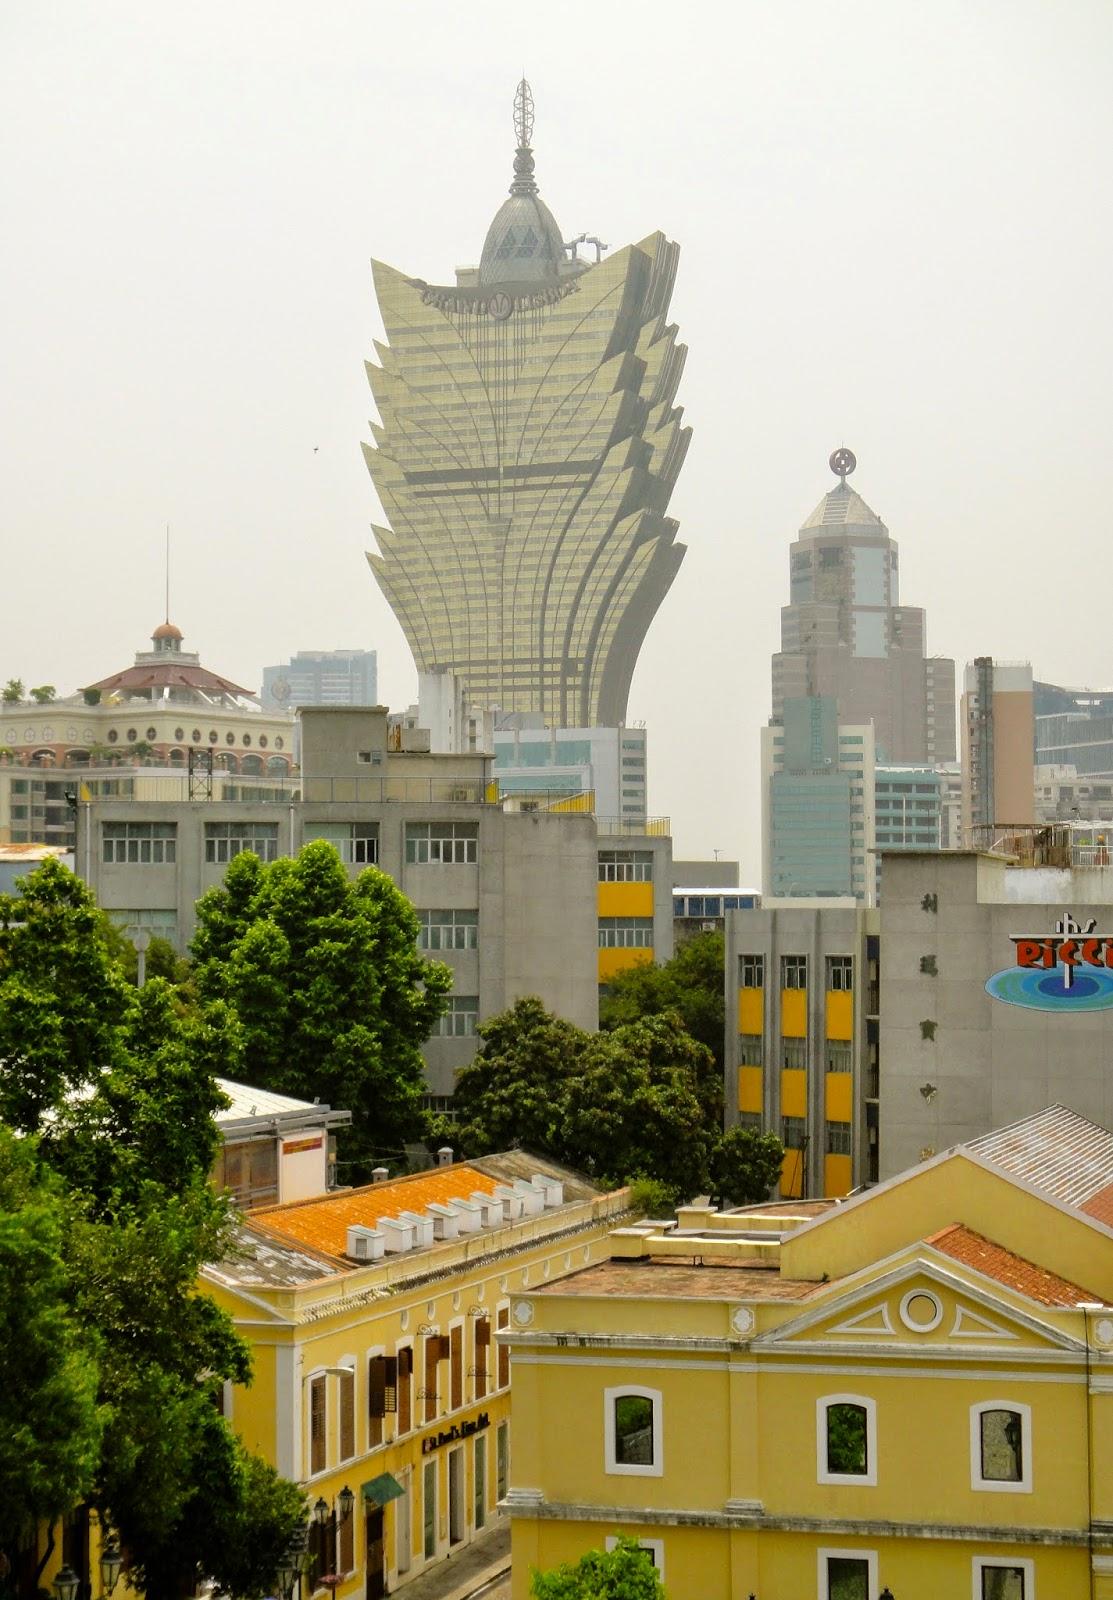 The Grand Lisboa Casino Macau